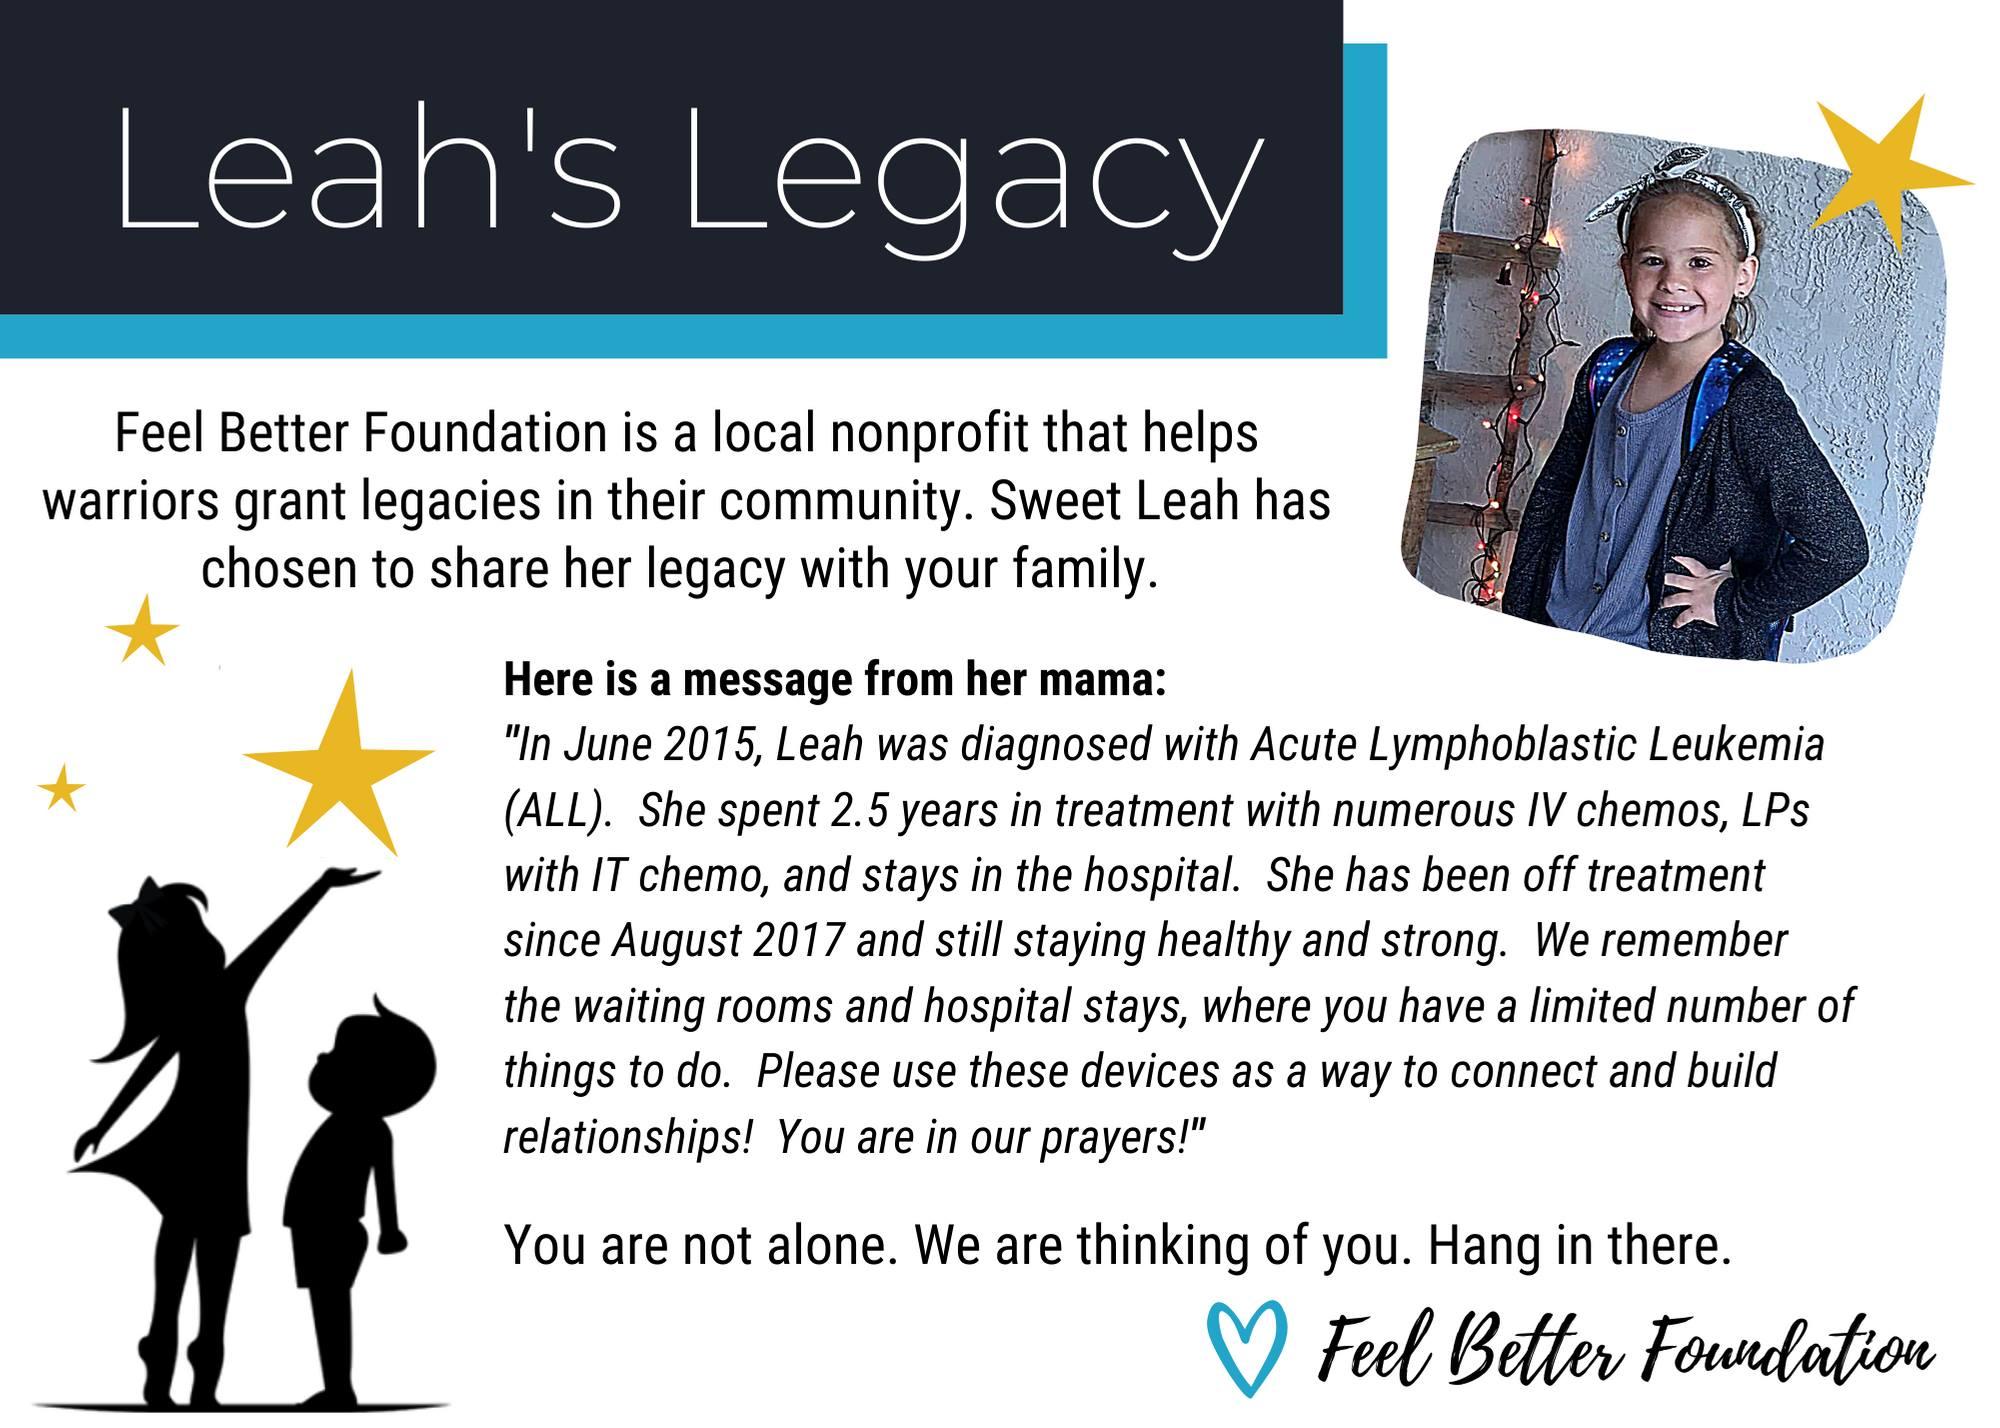 Leah's Legacy